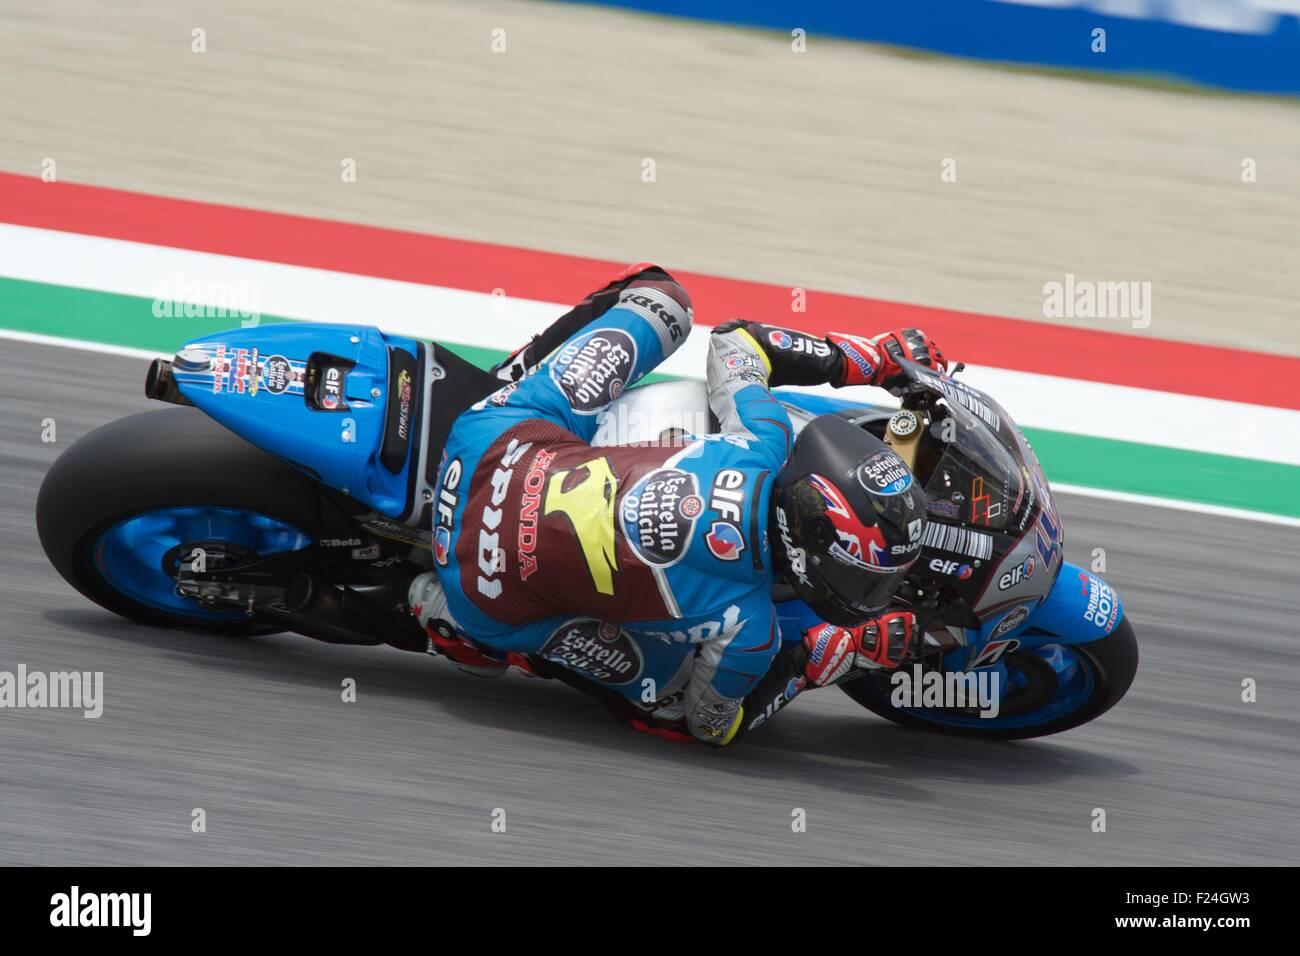 Mugello Circuit, Italy 30th May 2015. Scott Redding during qualifying for the Gran Premio D'Italia at the Mugello - Stock Image